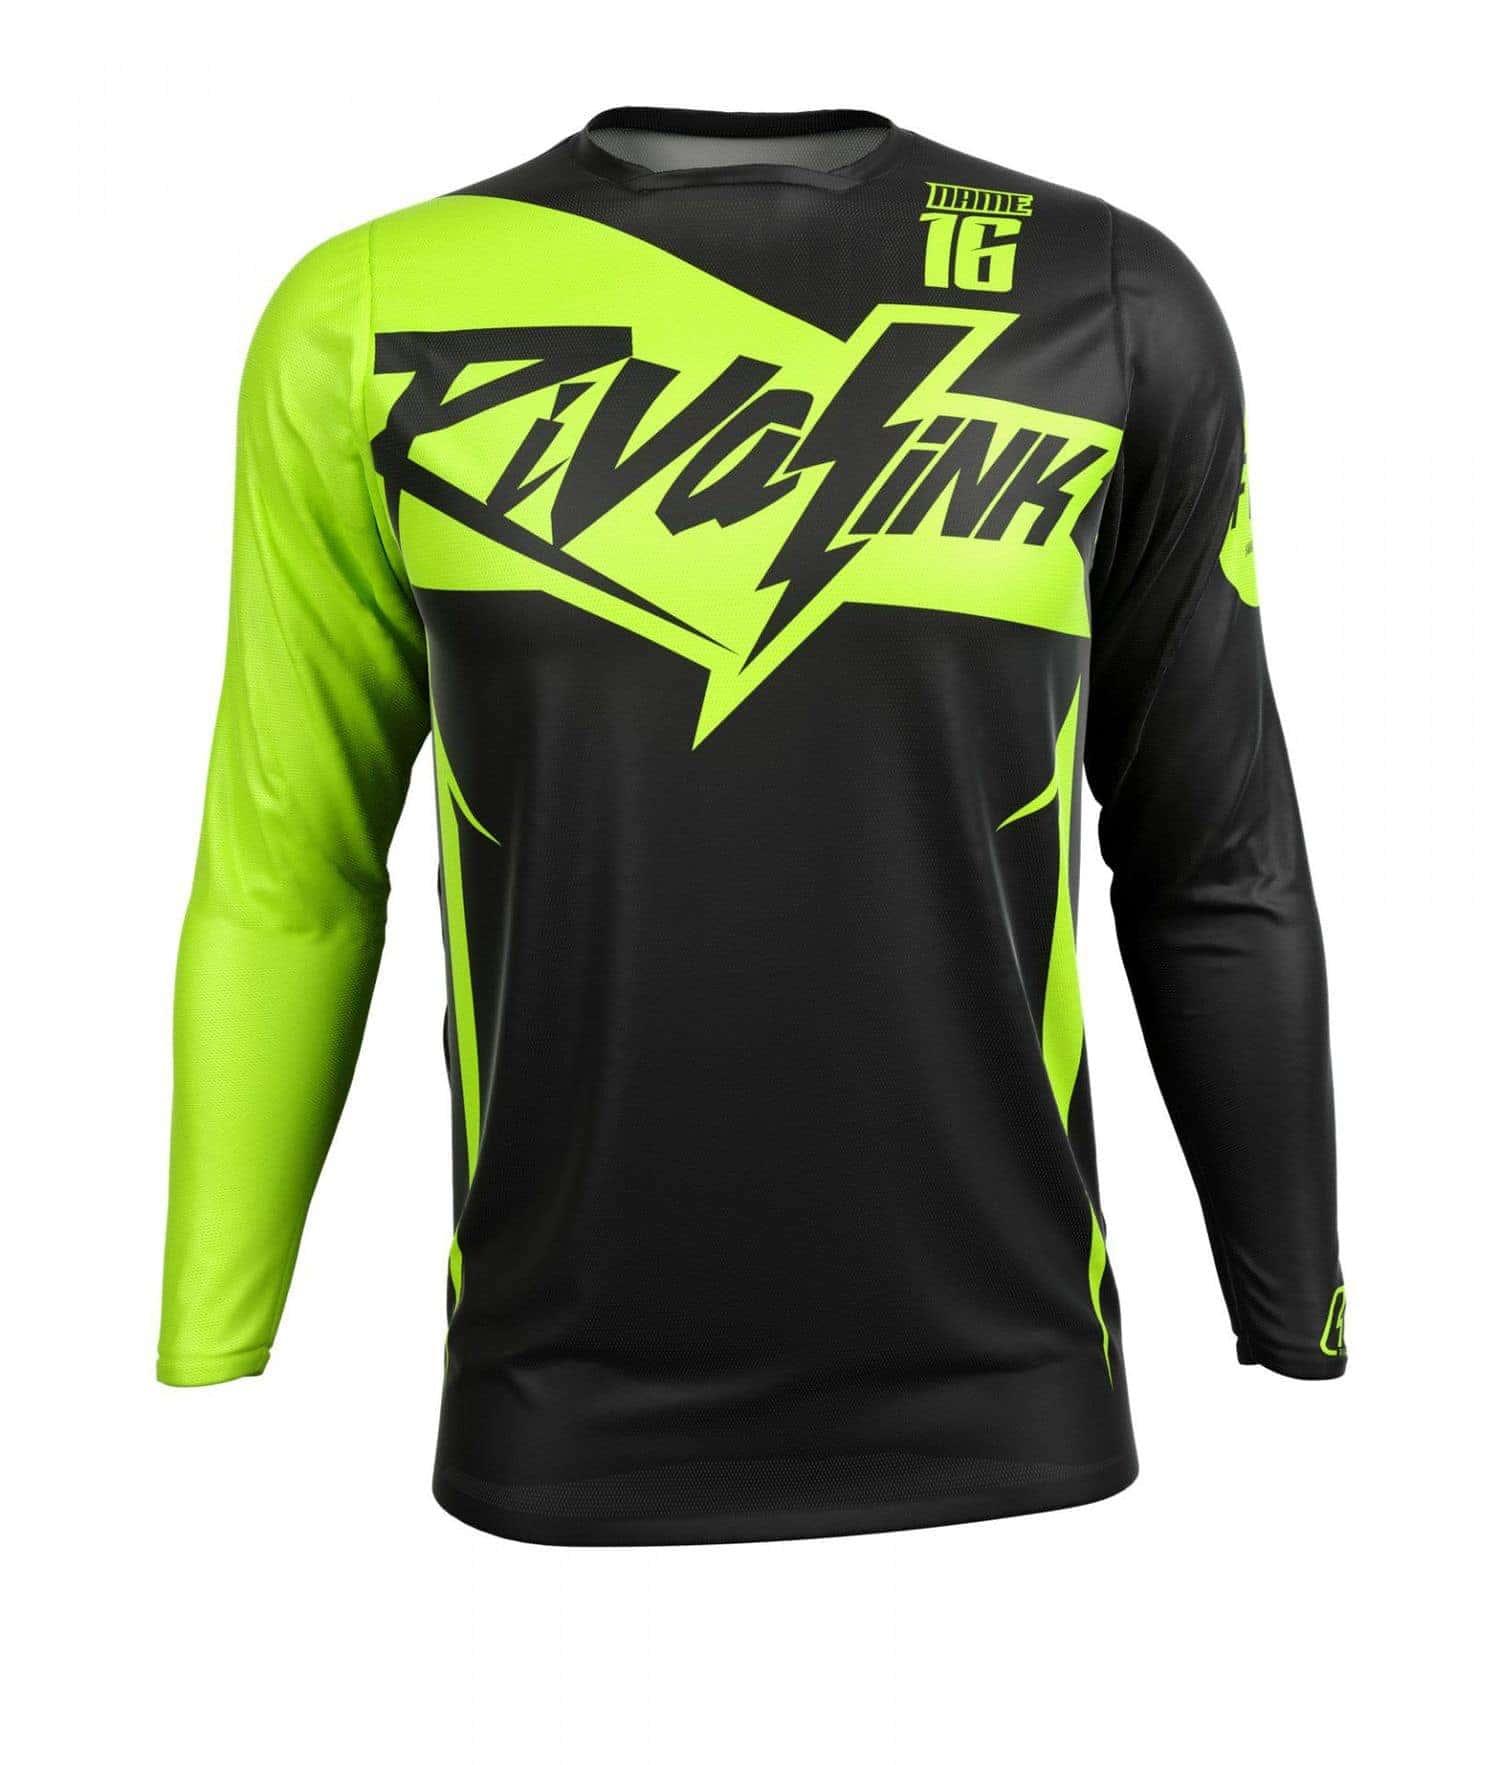 premium fit custom sublimated jersey saber neon rival ink design co custom motocross graphics. Black Bedroom Furniture Sets. Home Design Ideas